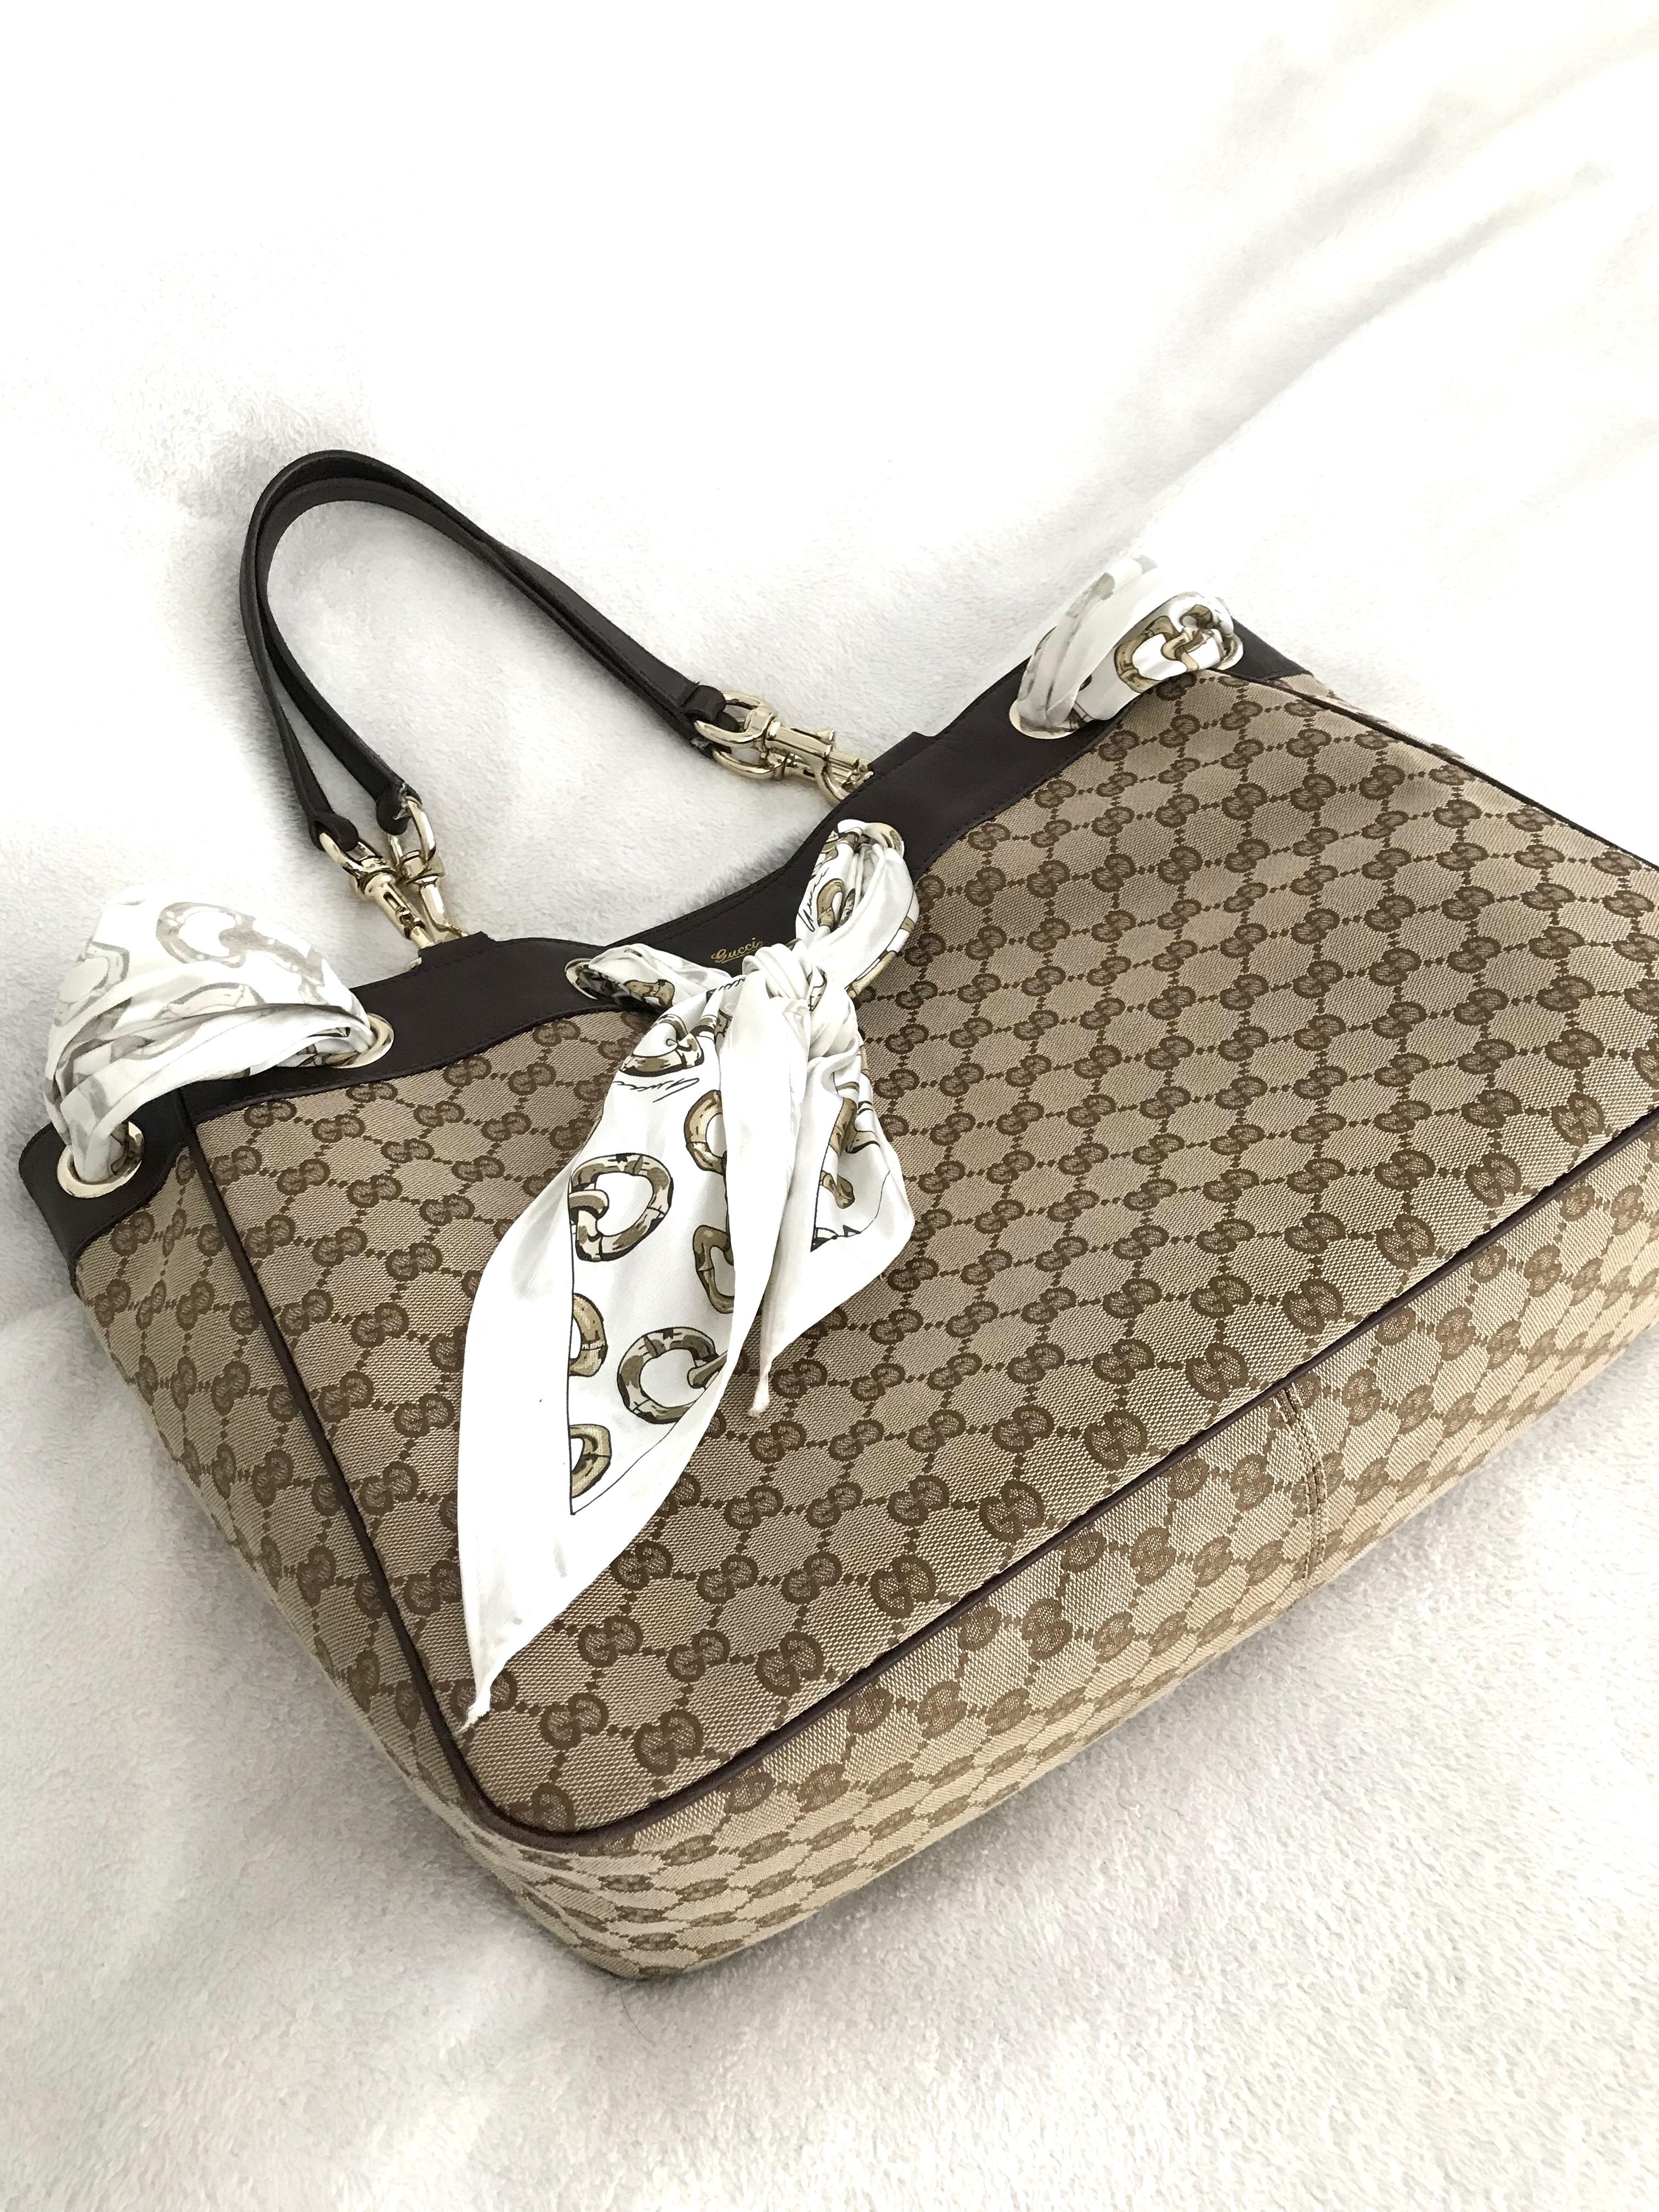 90c600876b5 Gucci Positano Large Tote With Scarf - Luxurylana Boutique